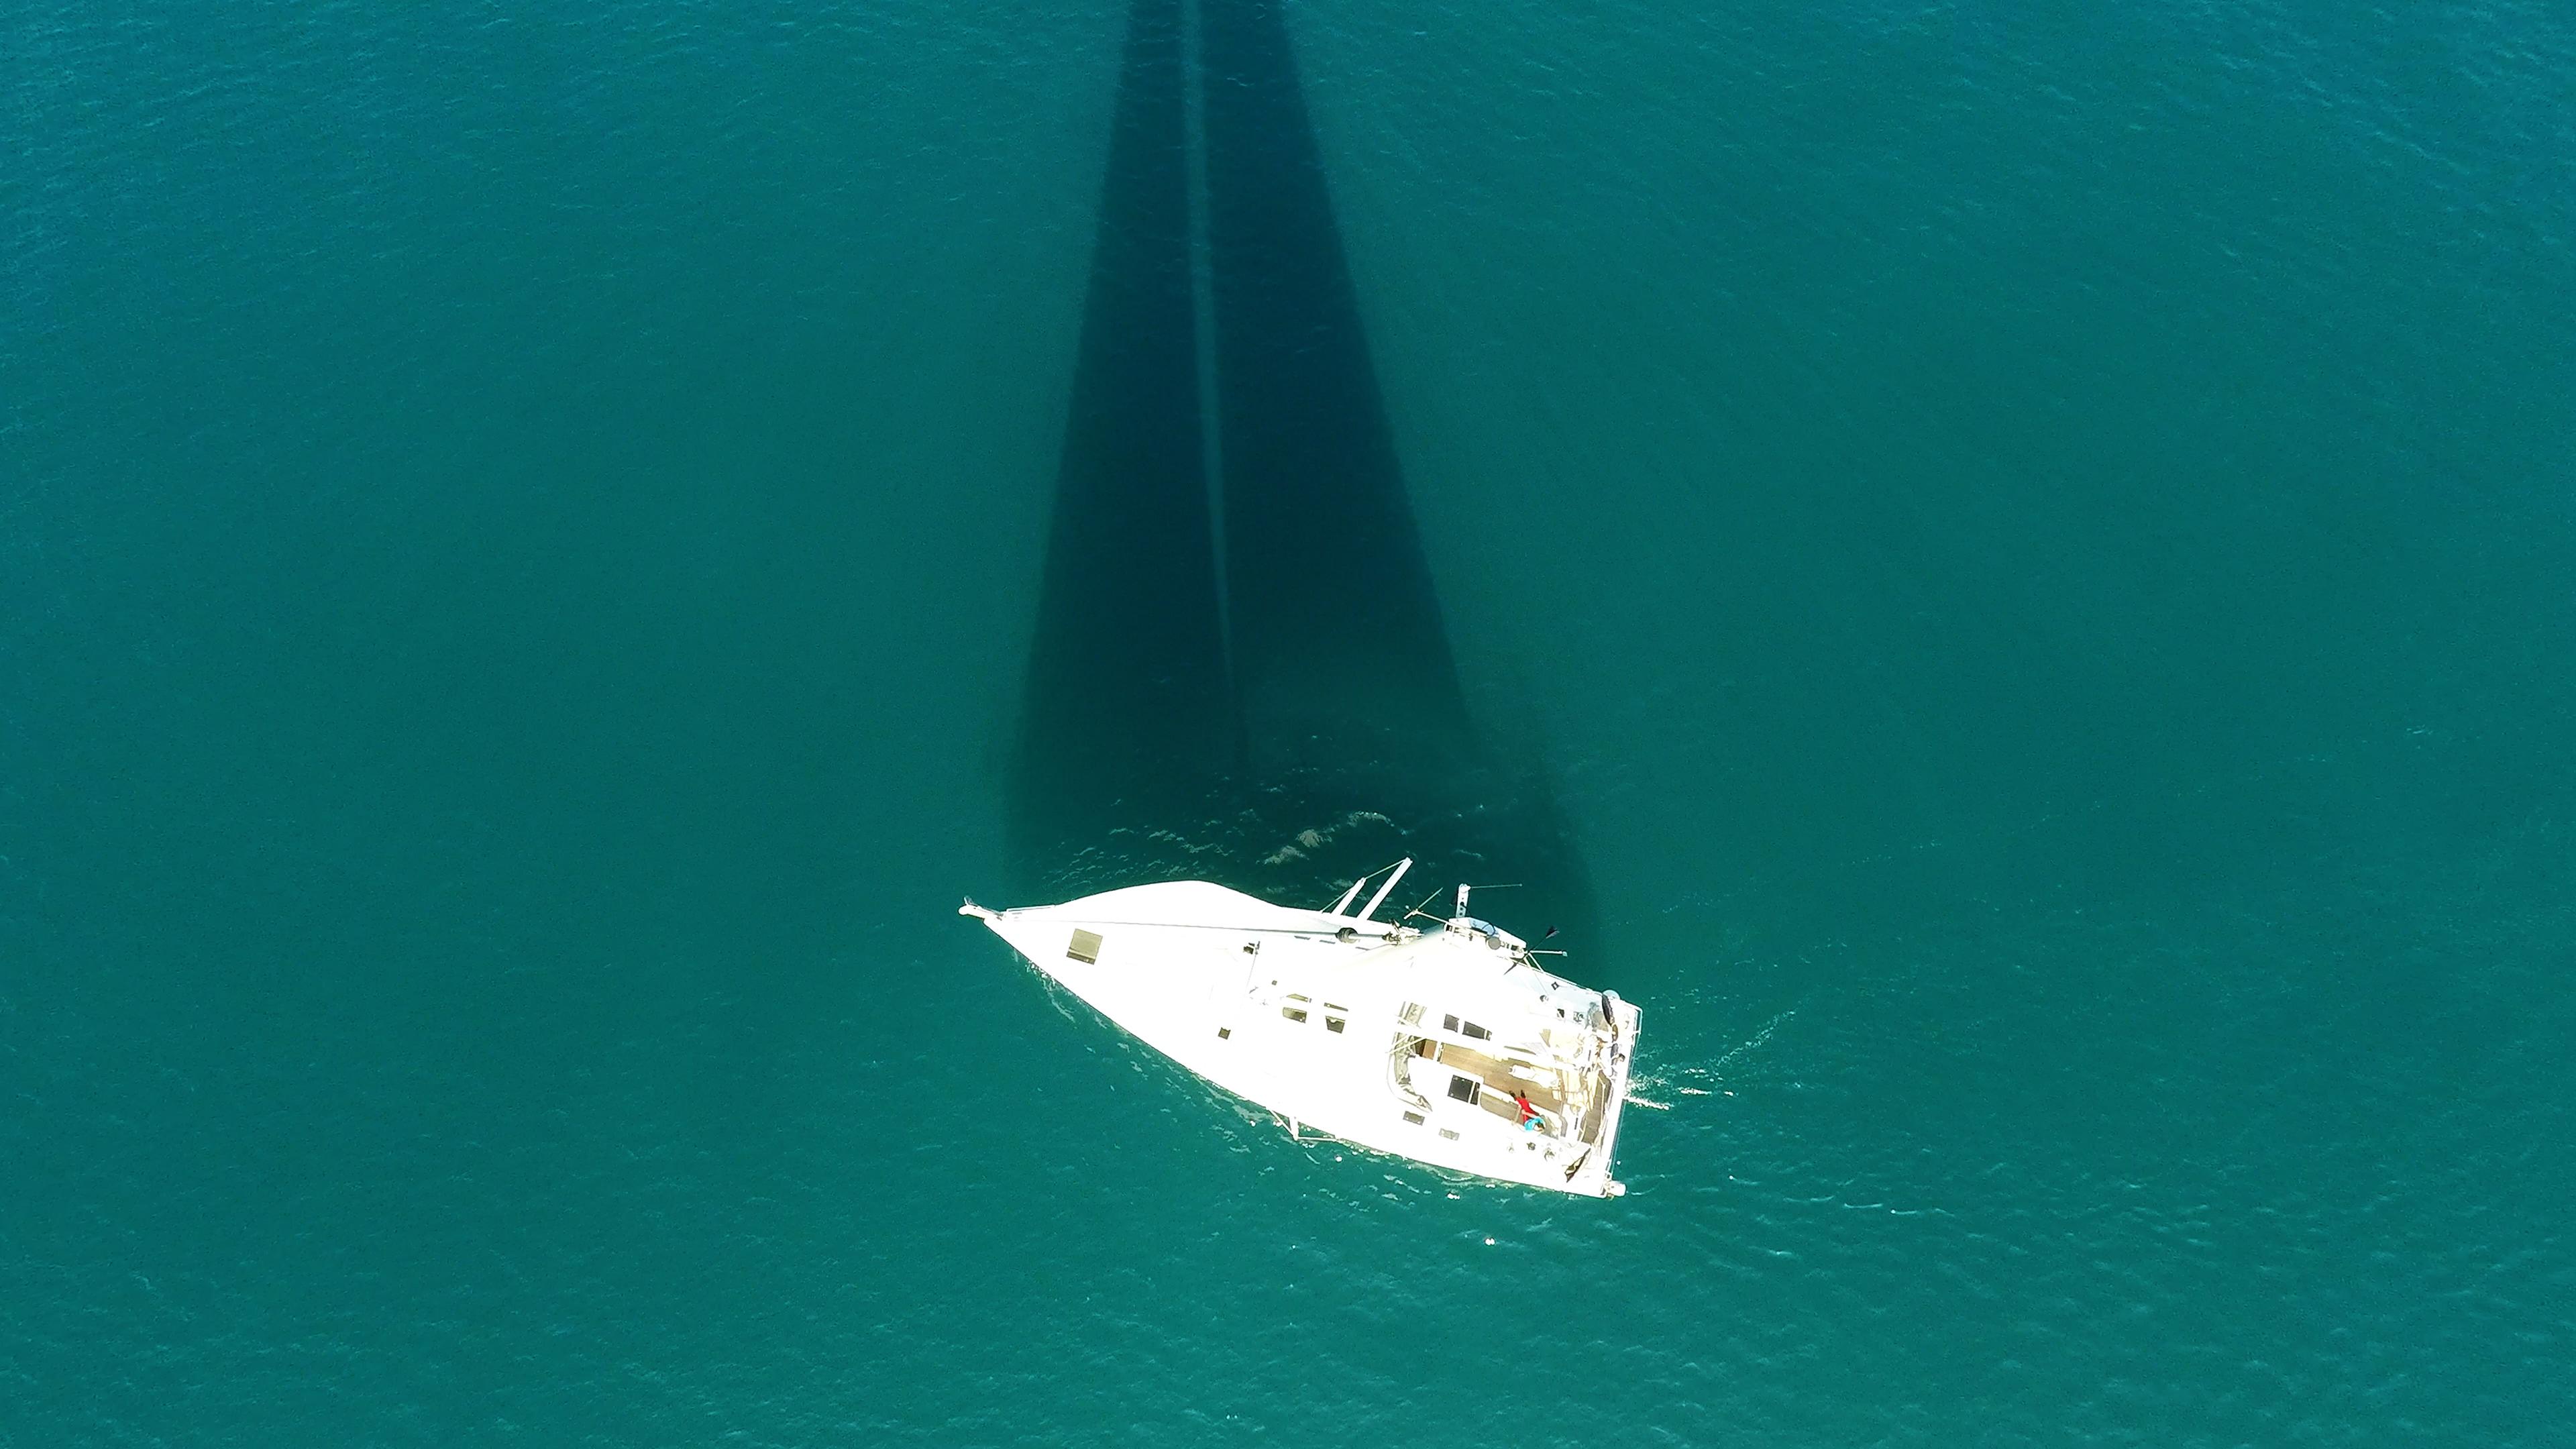 barcha a vela barca a vela vista verticalee nadir coperta per yacht a vela cima dell'albero